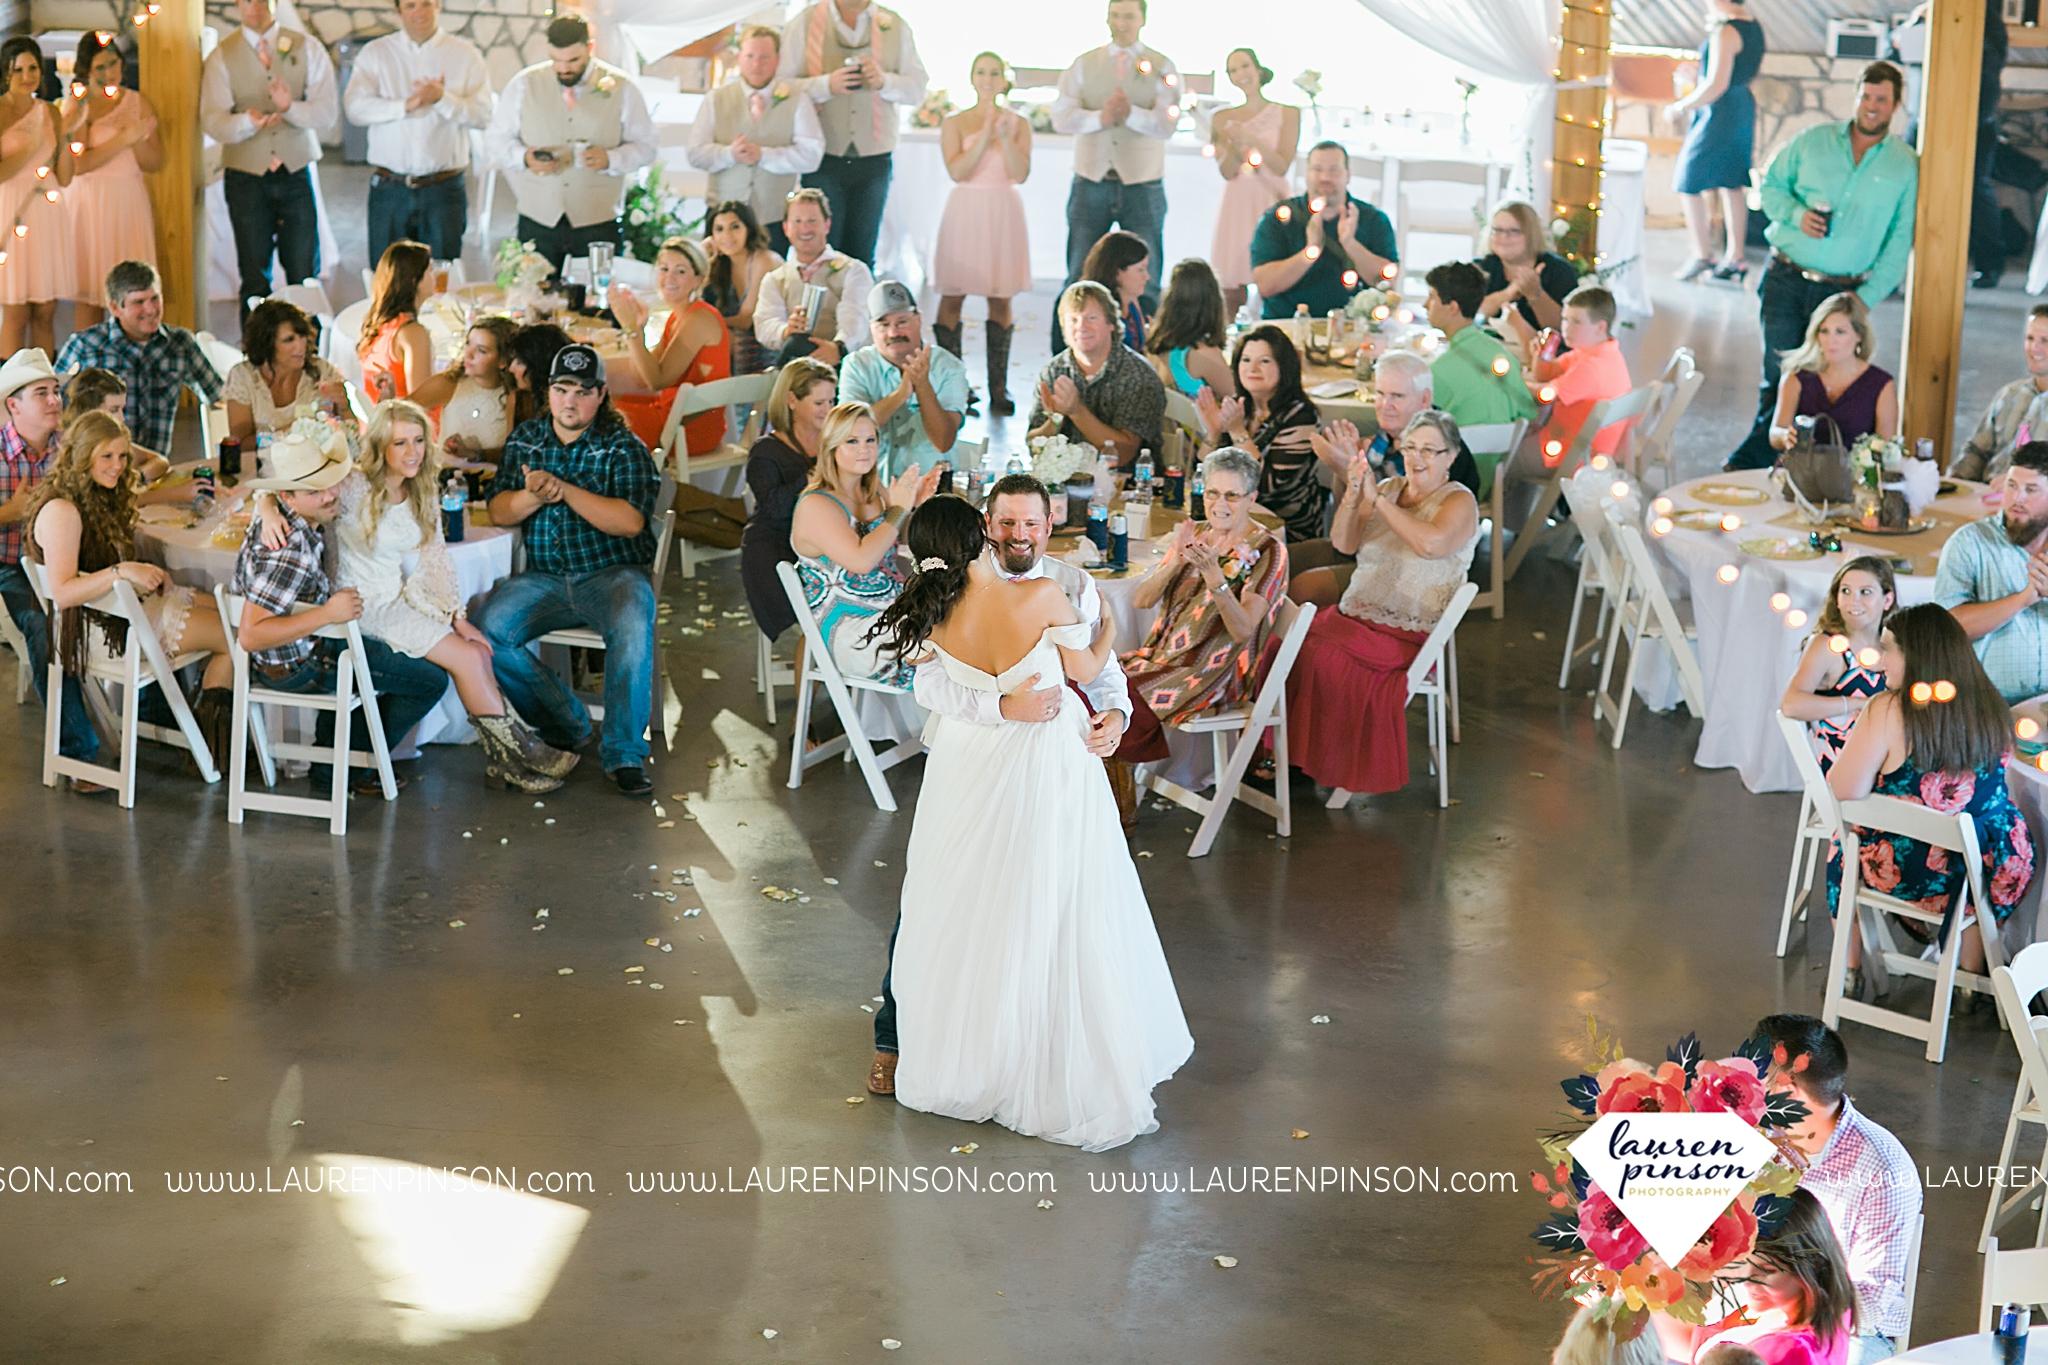 jones-barn-willow-creek-ranch-wedding-in-cleburne-texas-fort-worth-dfw-wichita-falls-wedding-photography_3256.jpg